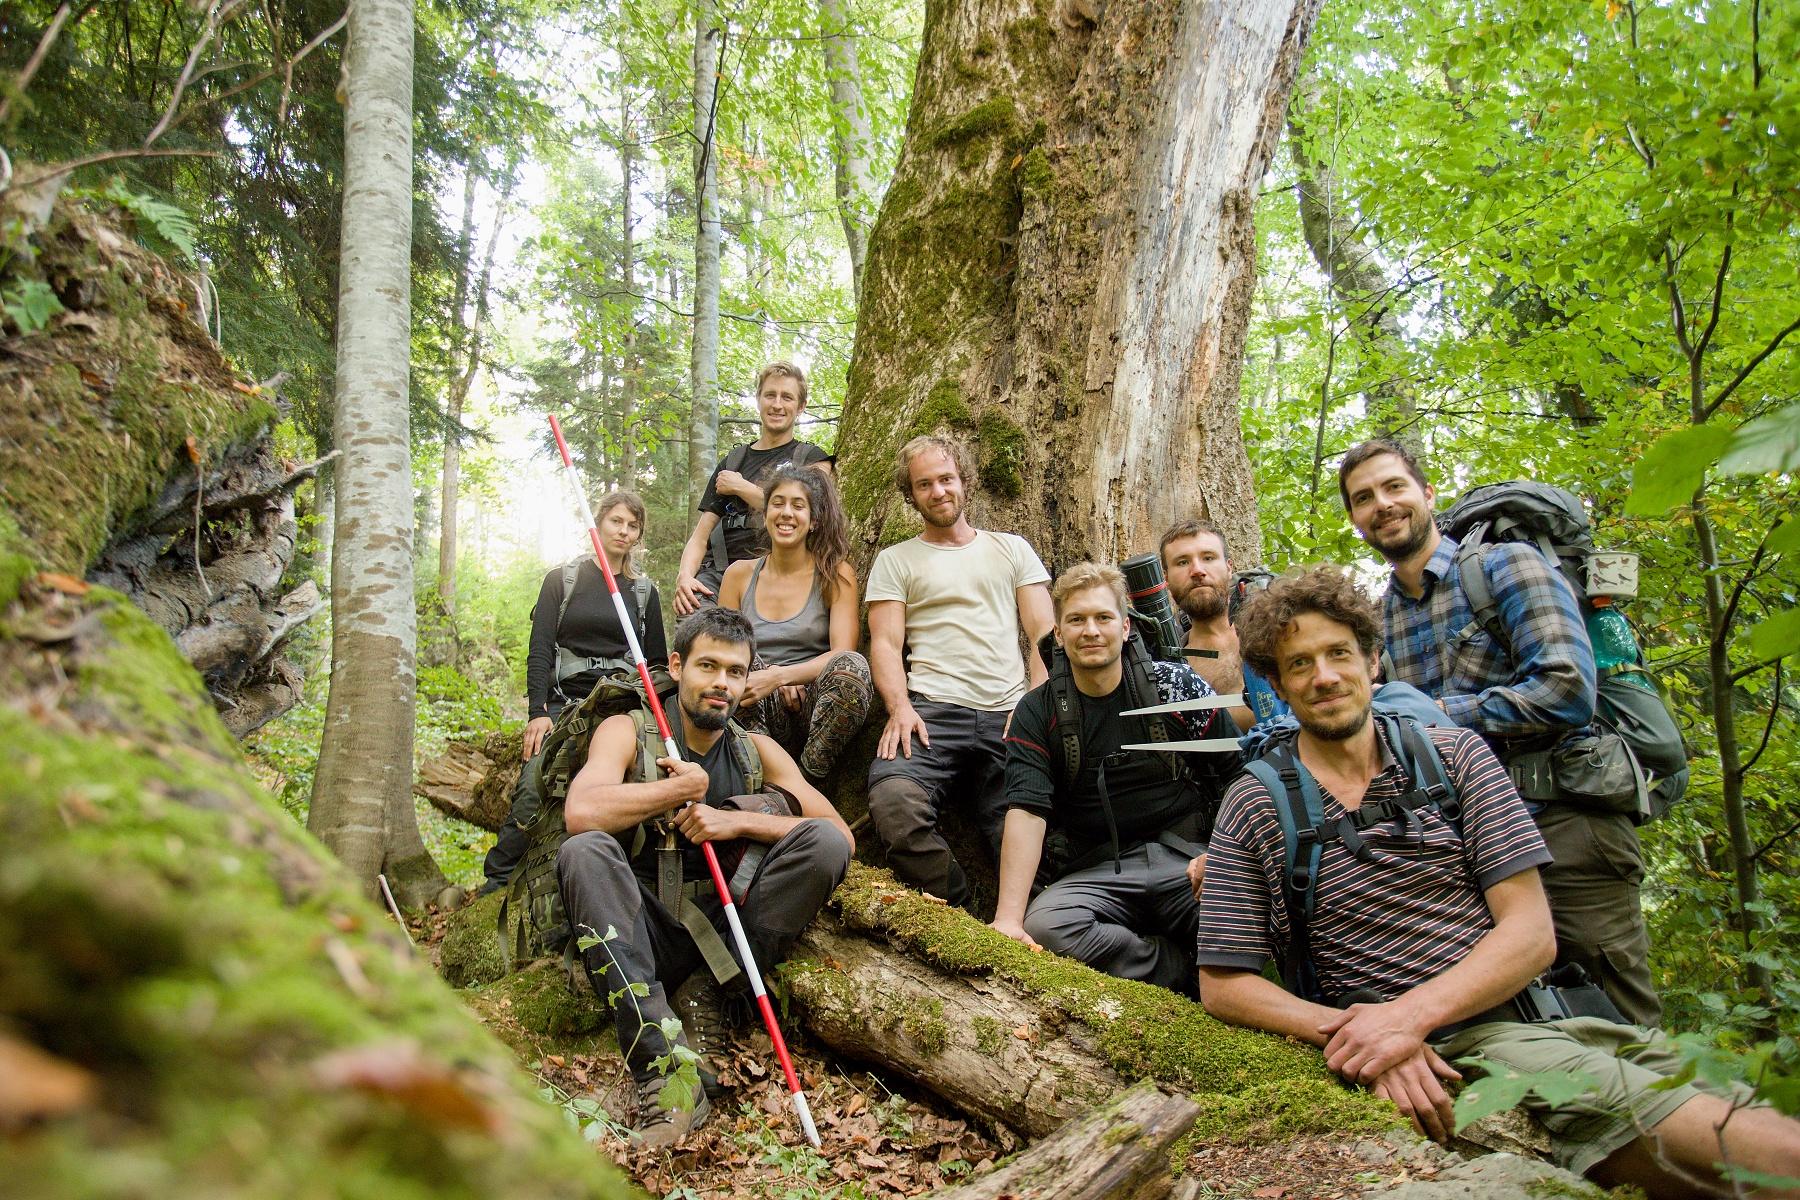 výskumný tím v pralese pohoria Maramureš, Paulic valley, Munții Maramureșului, Romania Canon EOS 6d mark II + Canon 17-40mm, 24mm, 1/20, f4, ISO 2000, 25. september 2020